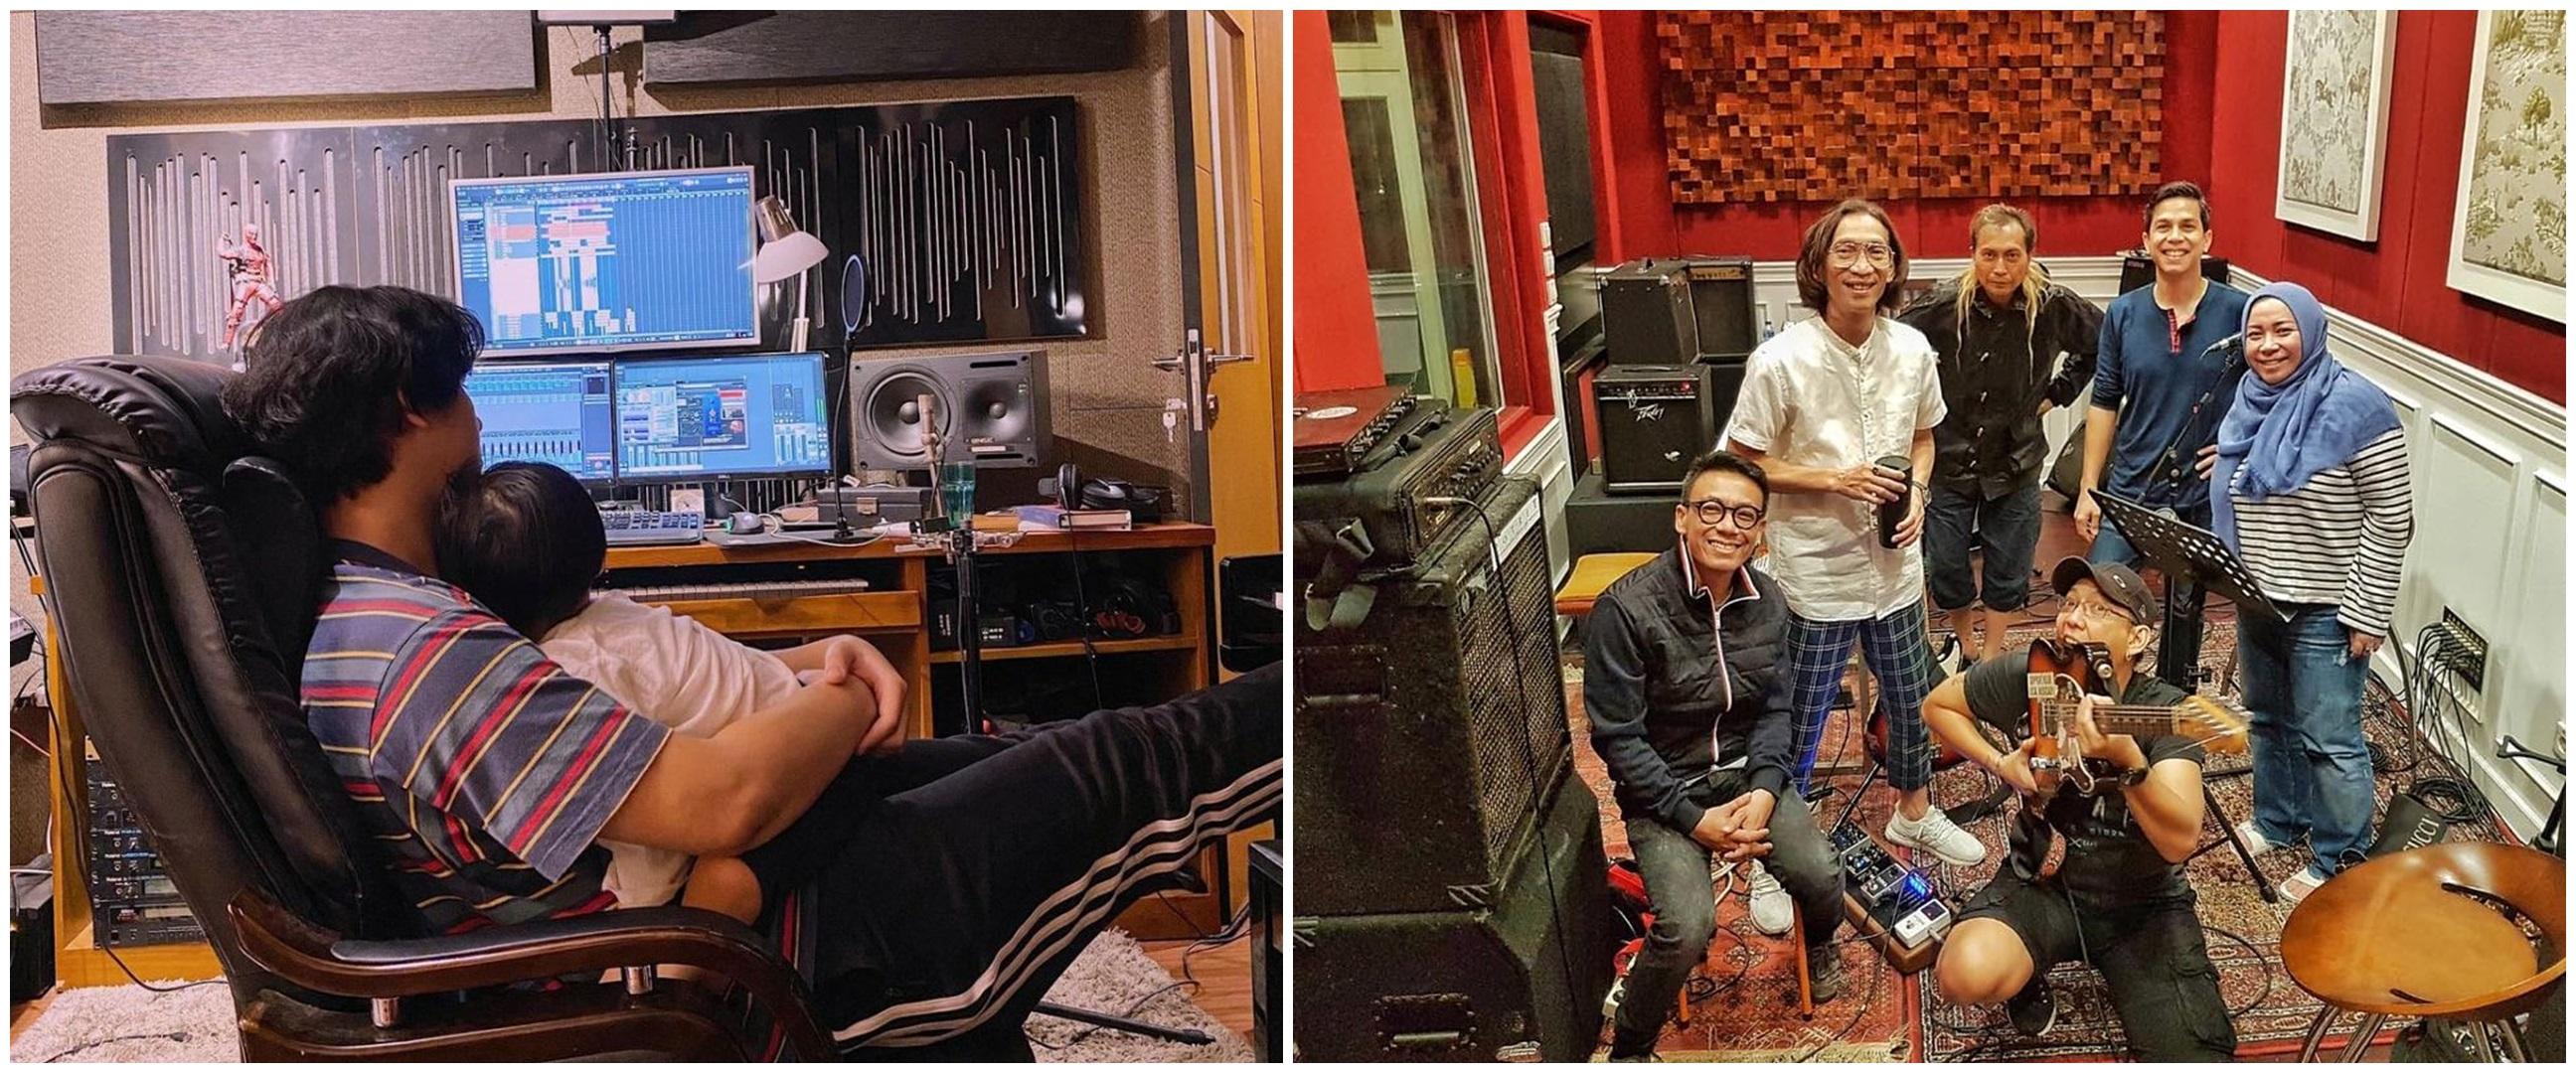 Potret studio musik 10 seleb, Andre Taulany penuh aksesori The Beatles